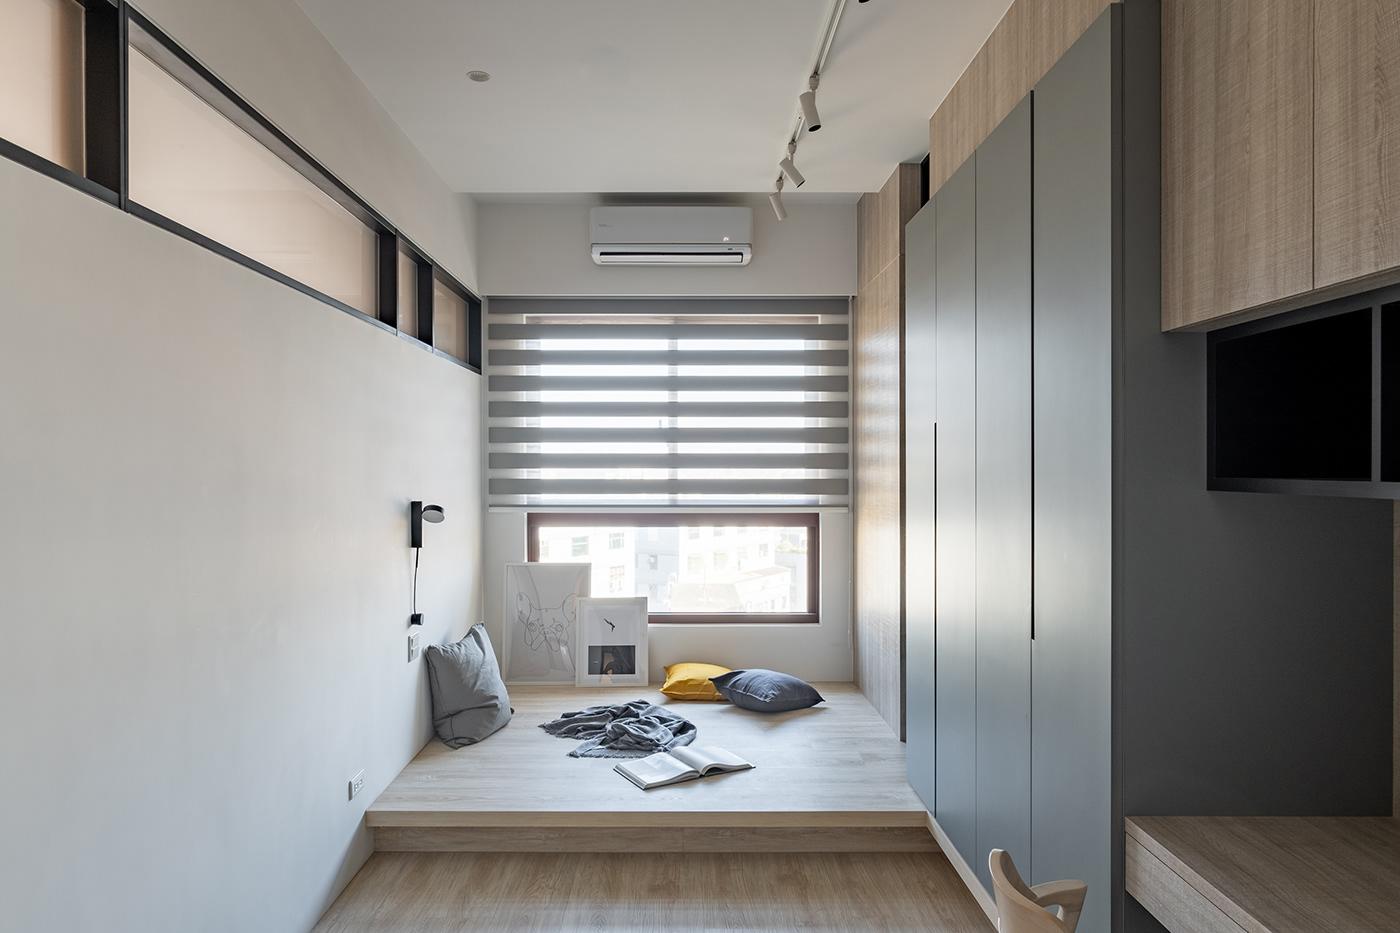 arch architecture design Interior interiordesign Photography